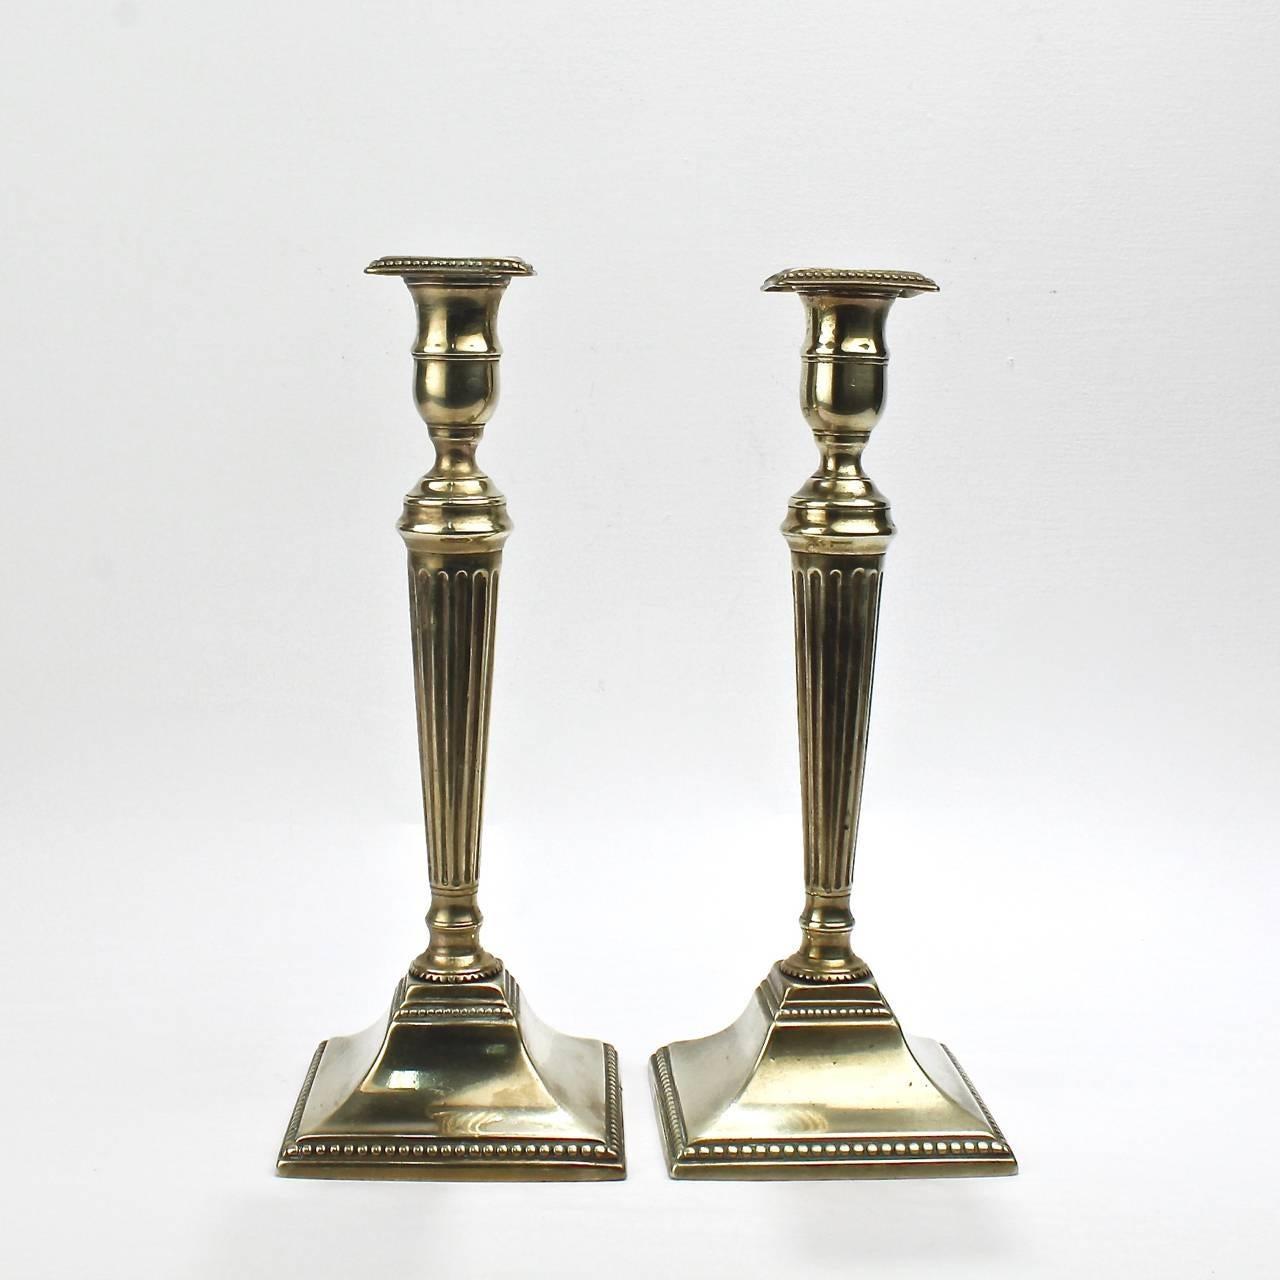 Dating english brass candlestick